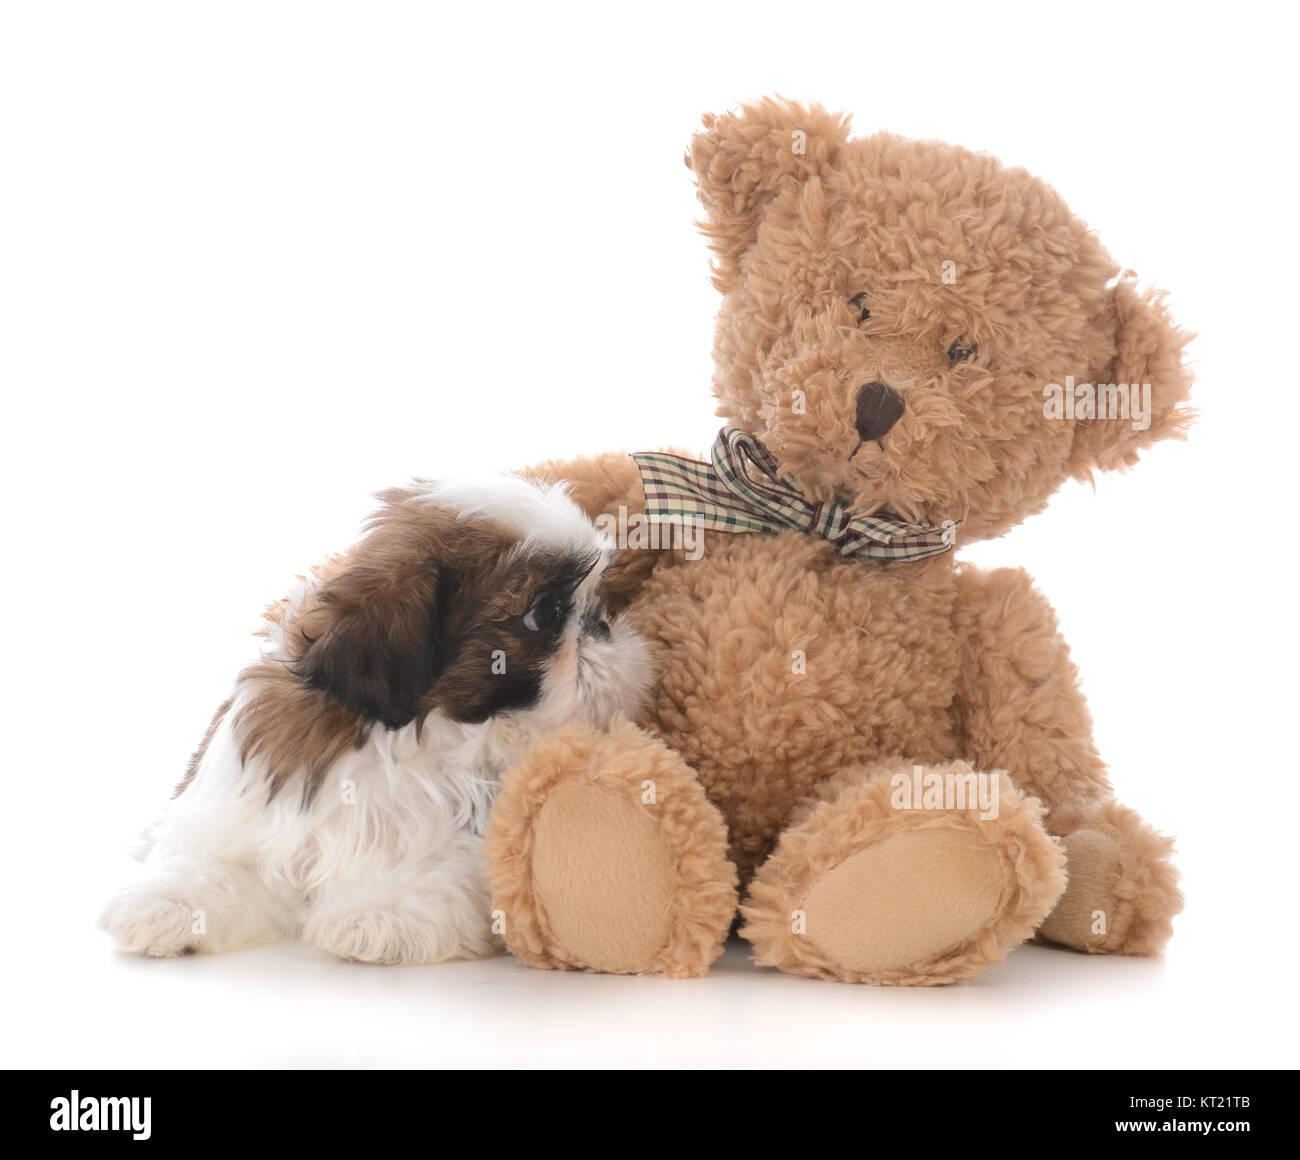 Shih Tzu Puppy With The Arm Of A Teddy Bear Around Him Stock Photo Alamy